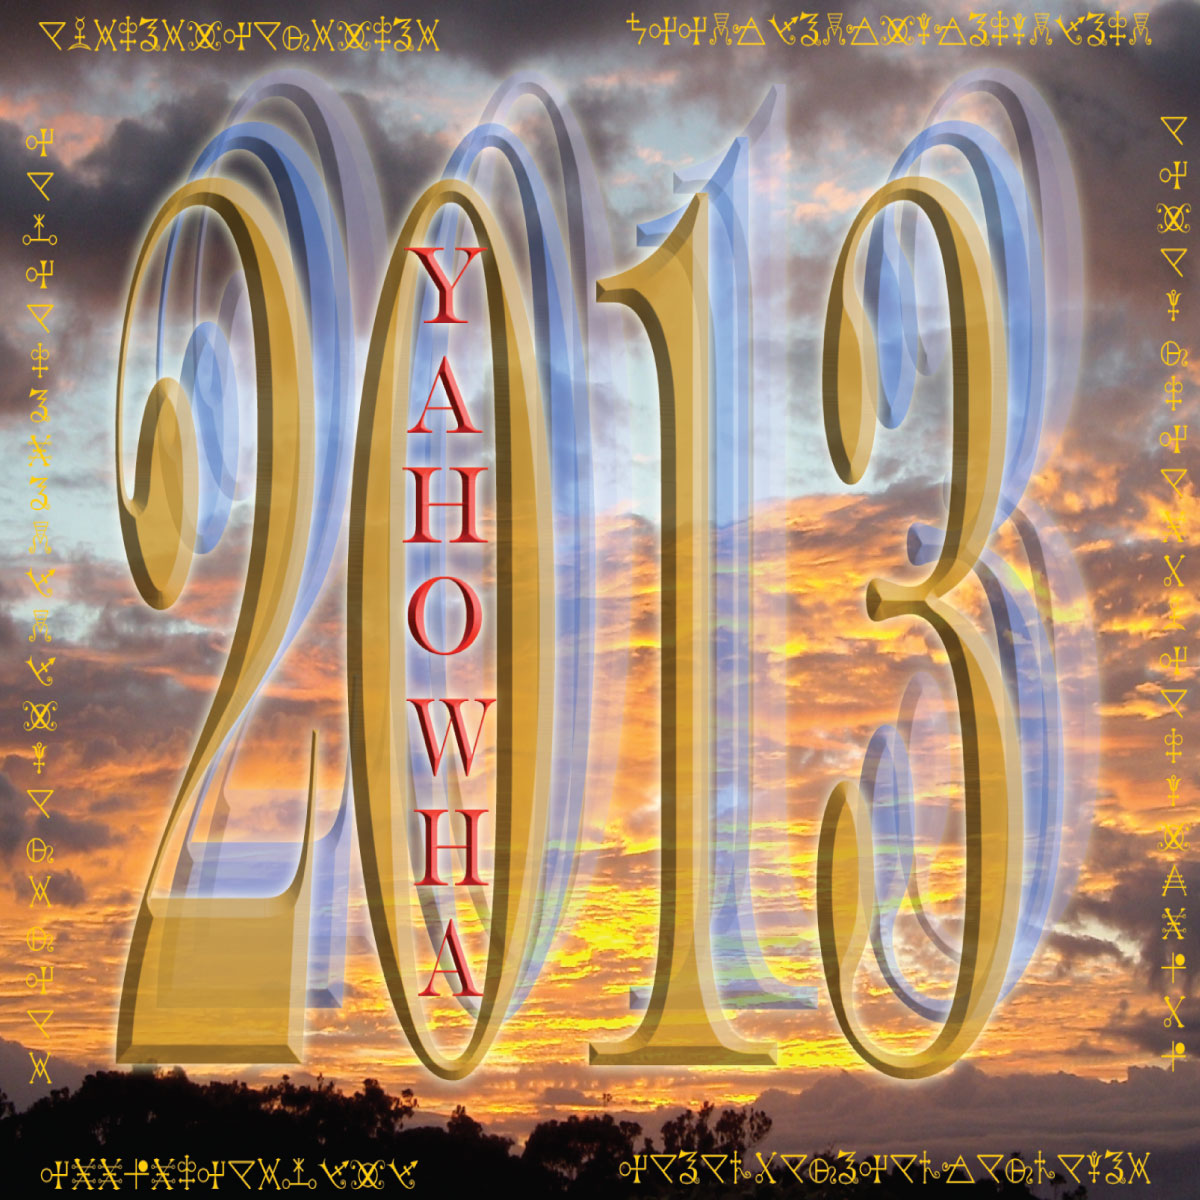 Yahowha 13   2013  DVD+CDx2